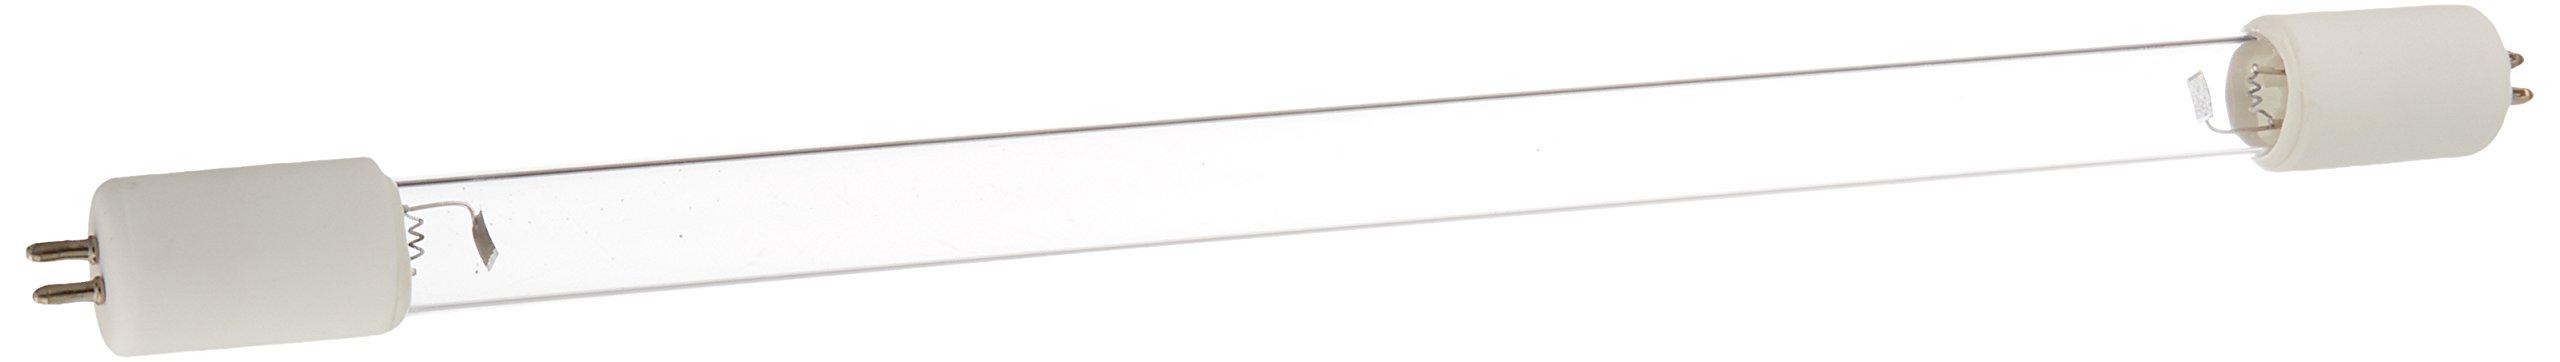 Hoover 440001064 LAMP, UV WH10600